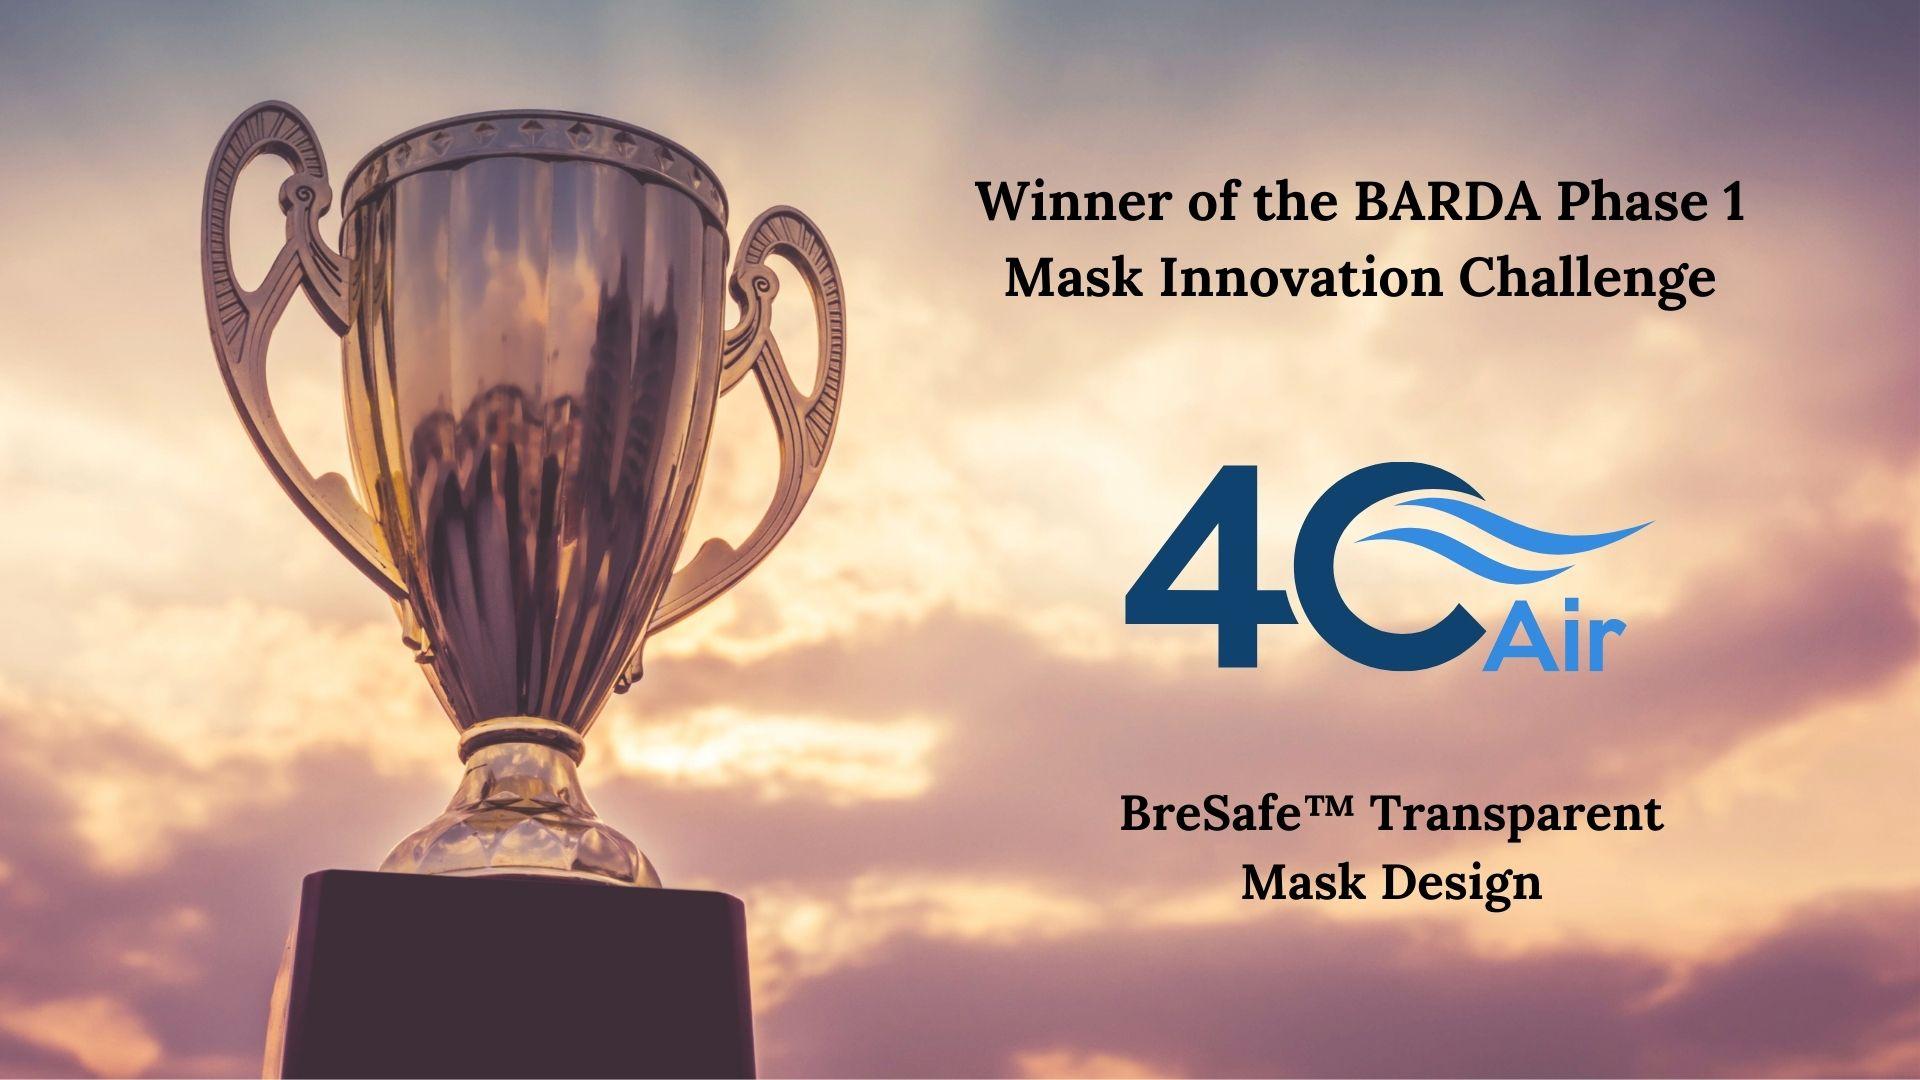 4C Air wins phase 1 BARDA Mask Challenge